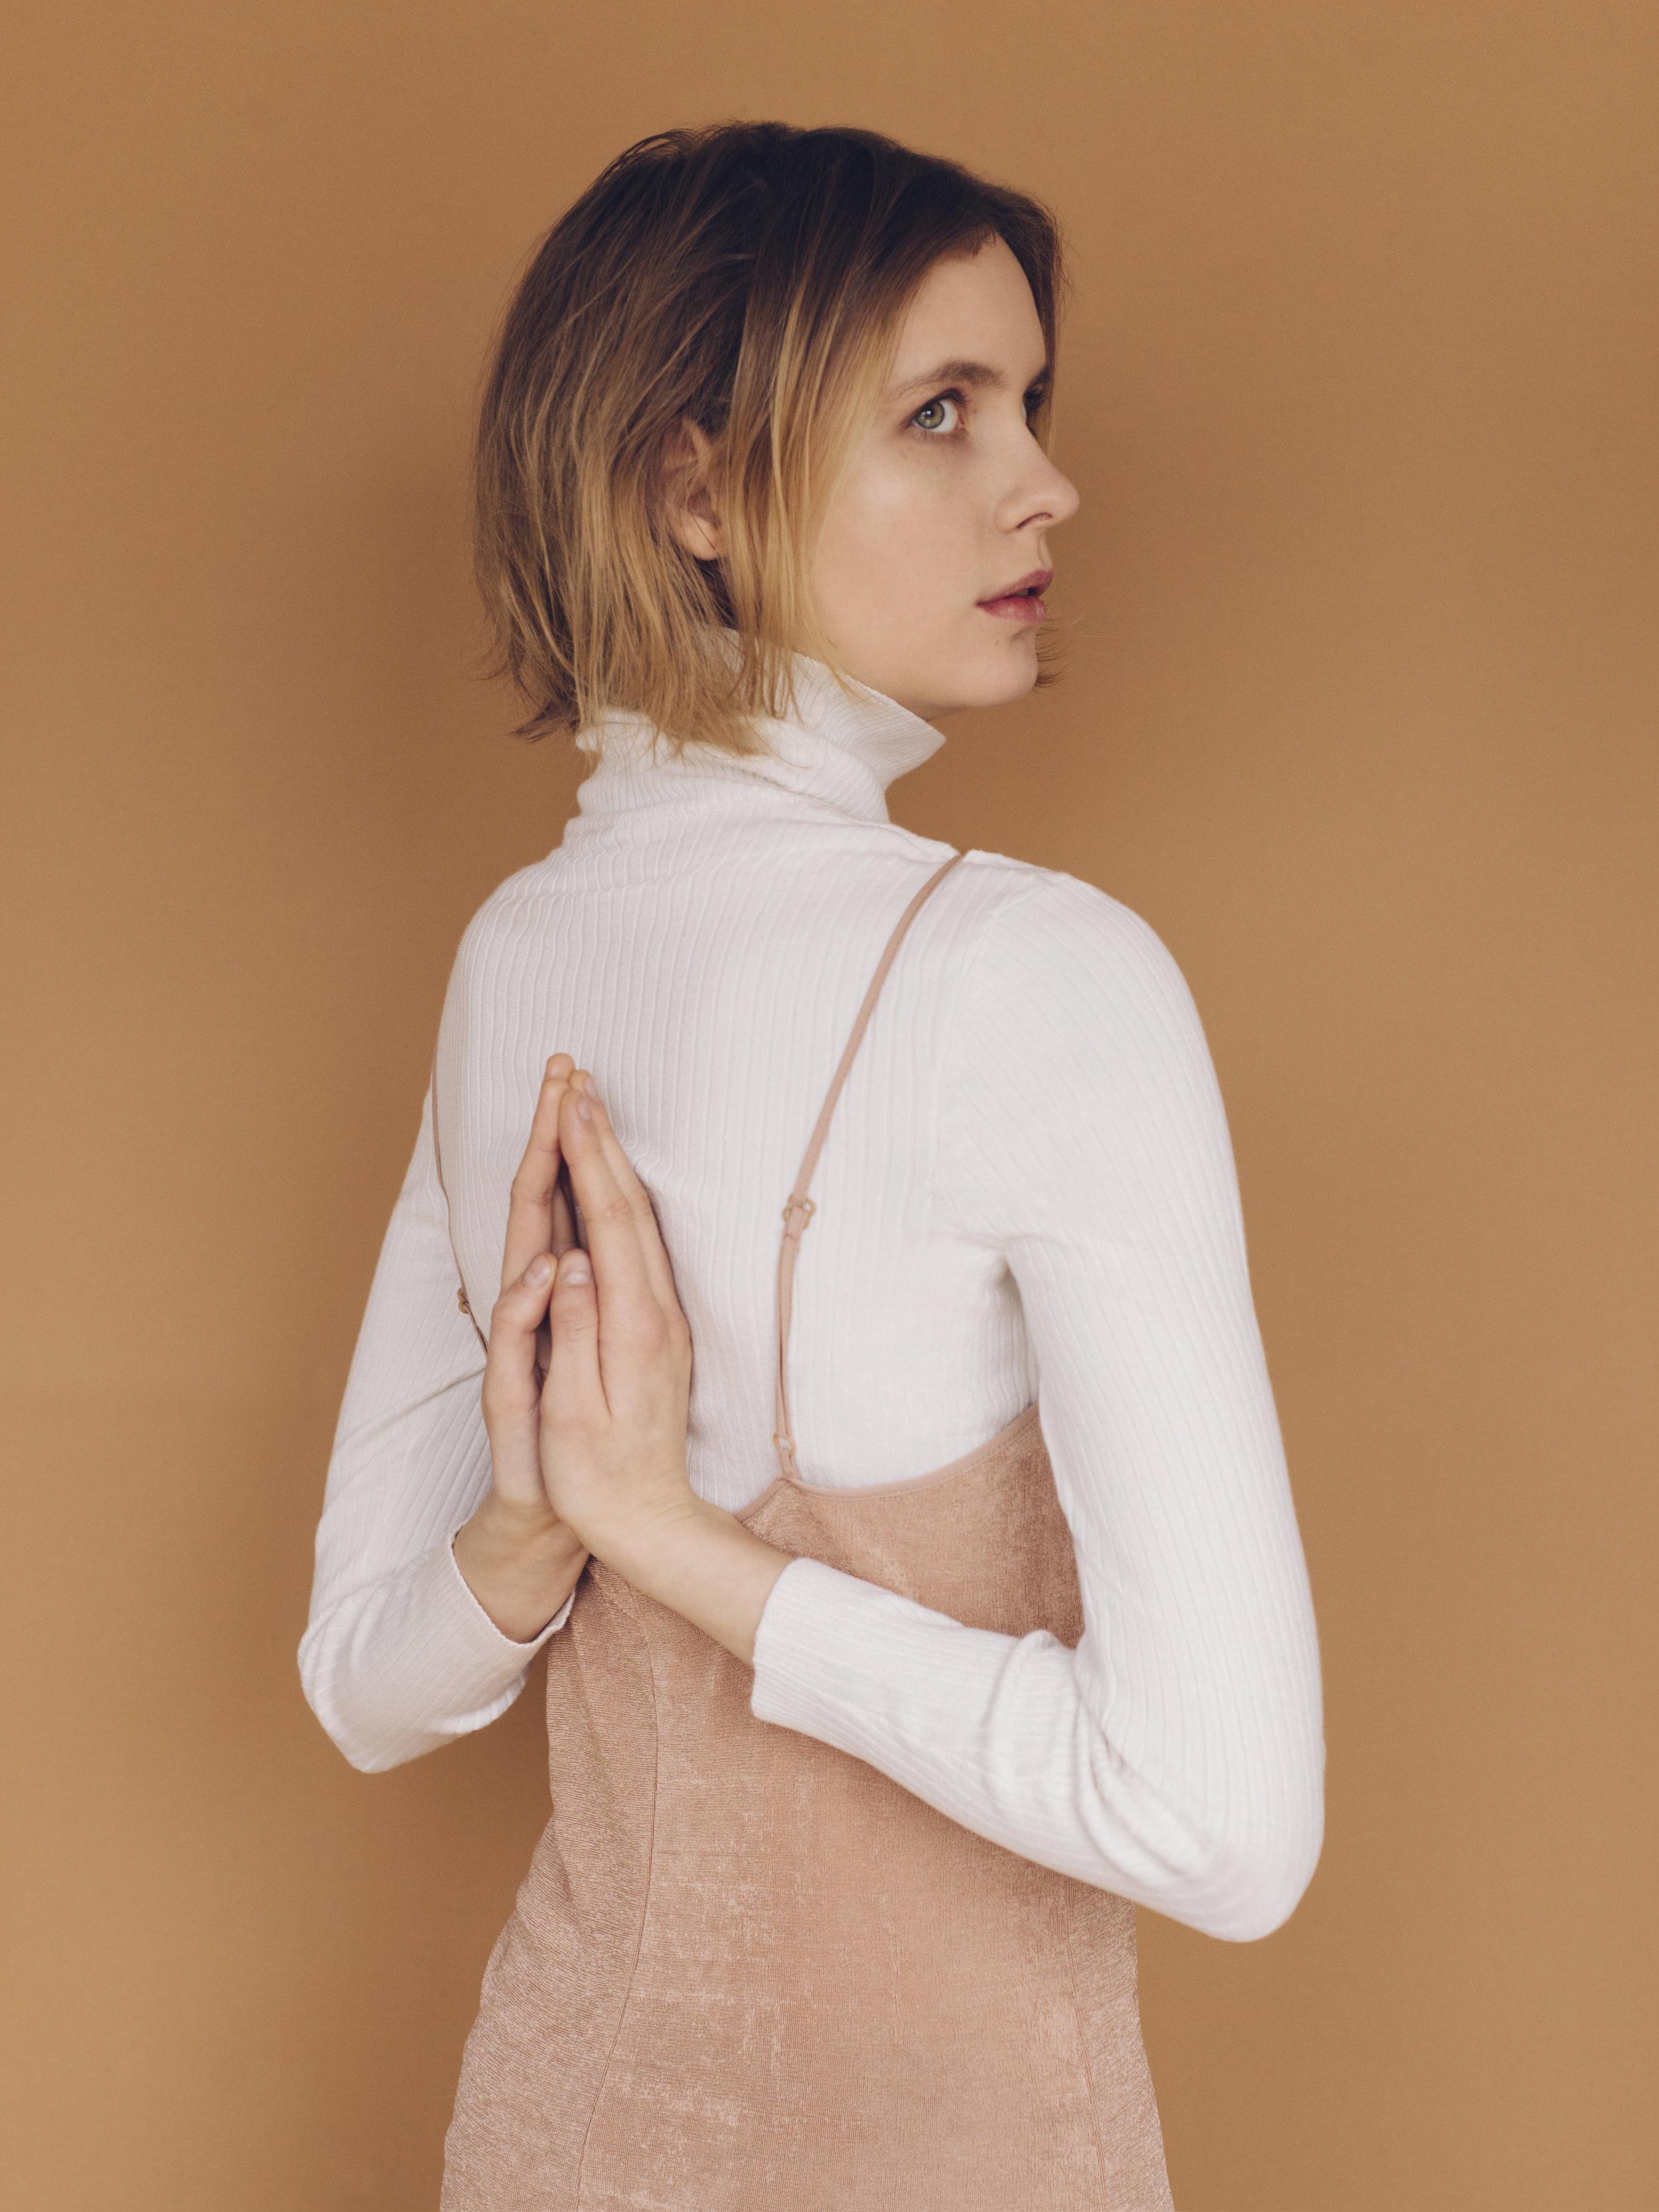 Ania Cywińska